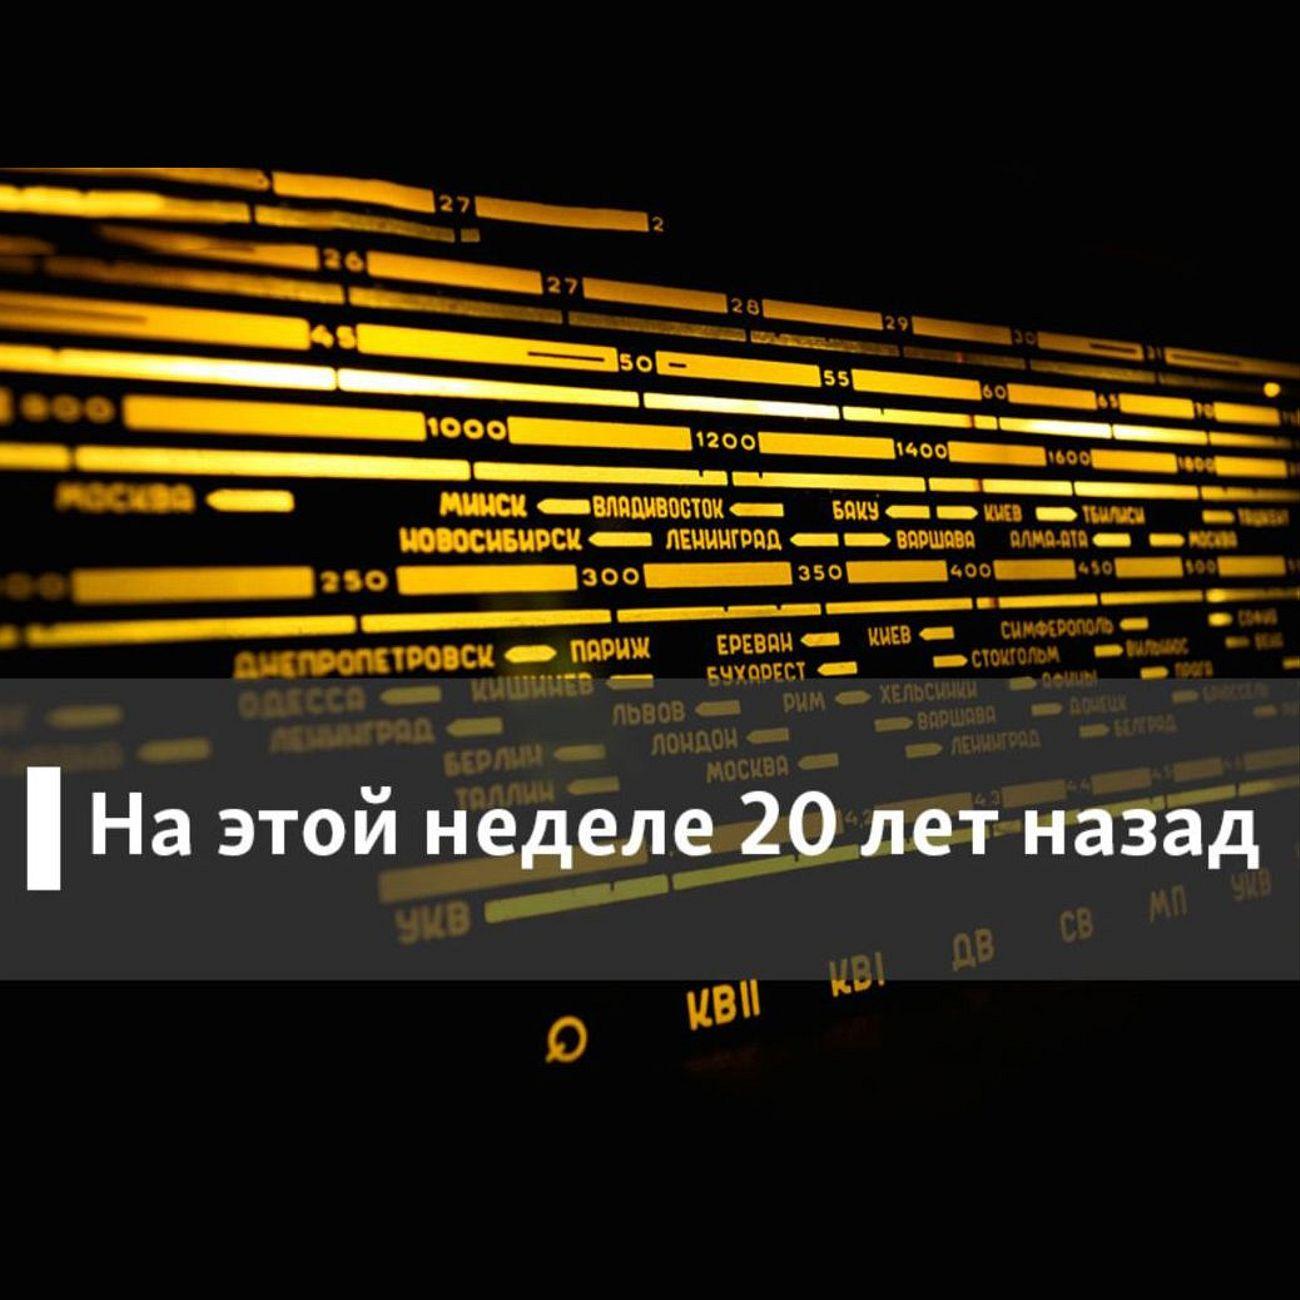 «Свобода» 20 лет назад